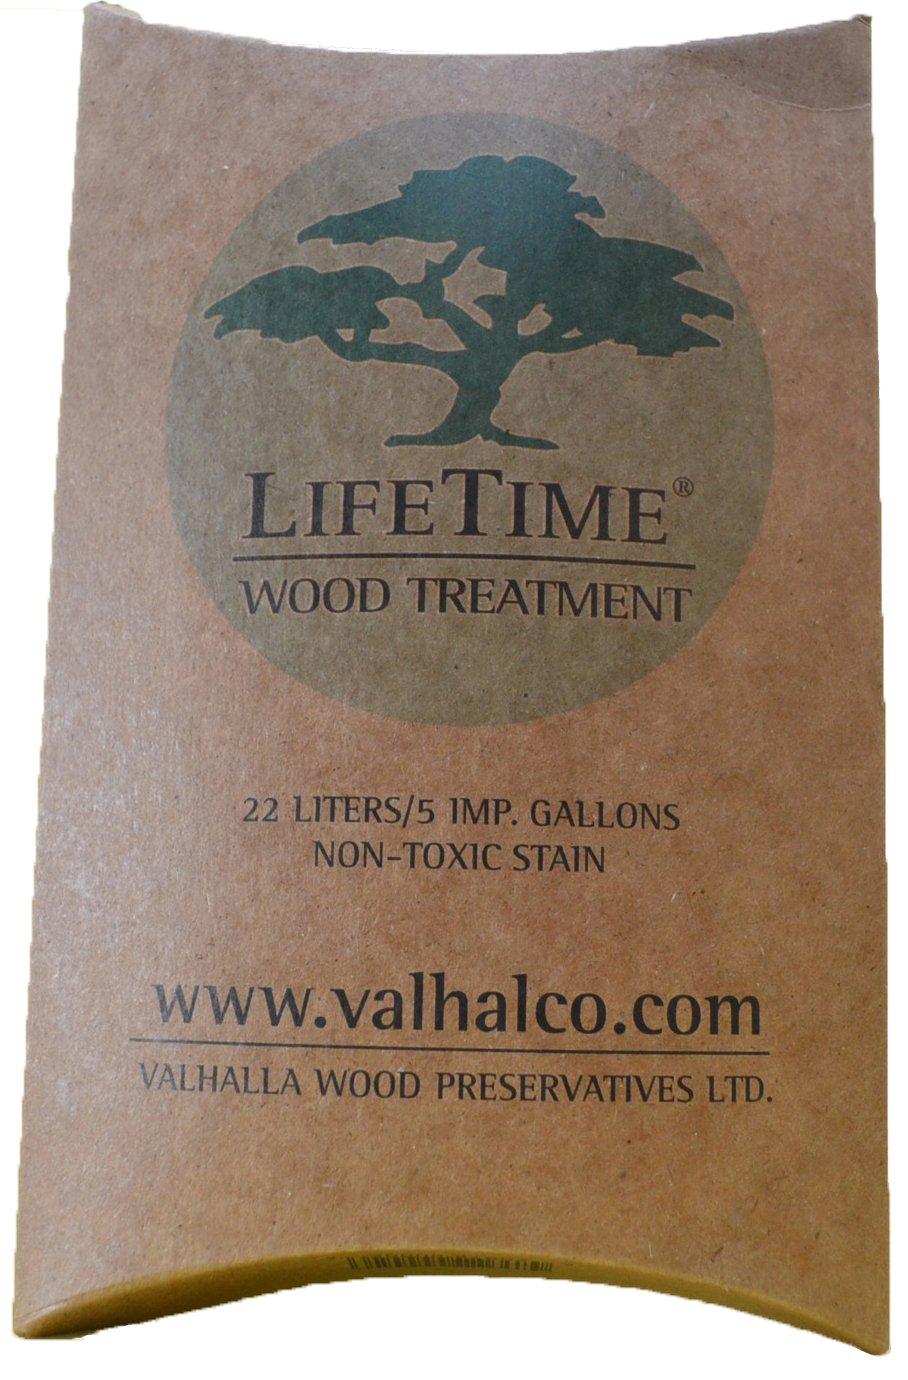 Valhalla Wood Preservatives 5-Gallon Eco Friendly Non Toxic Lifetime Wood Treatment Pouch